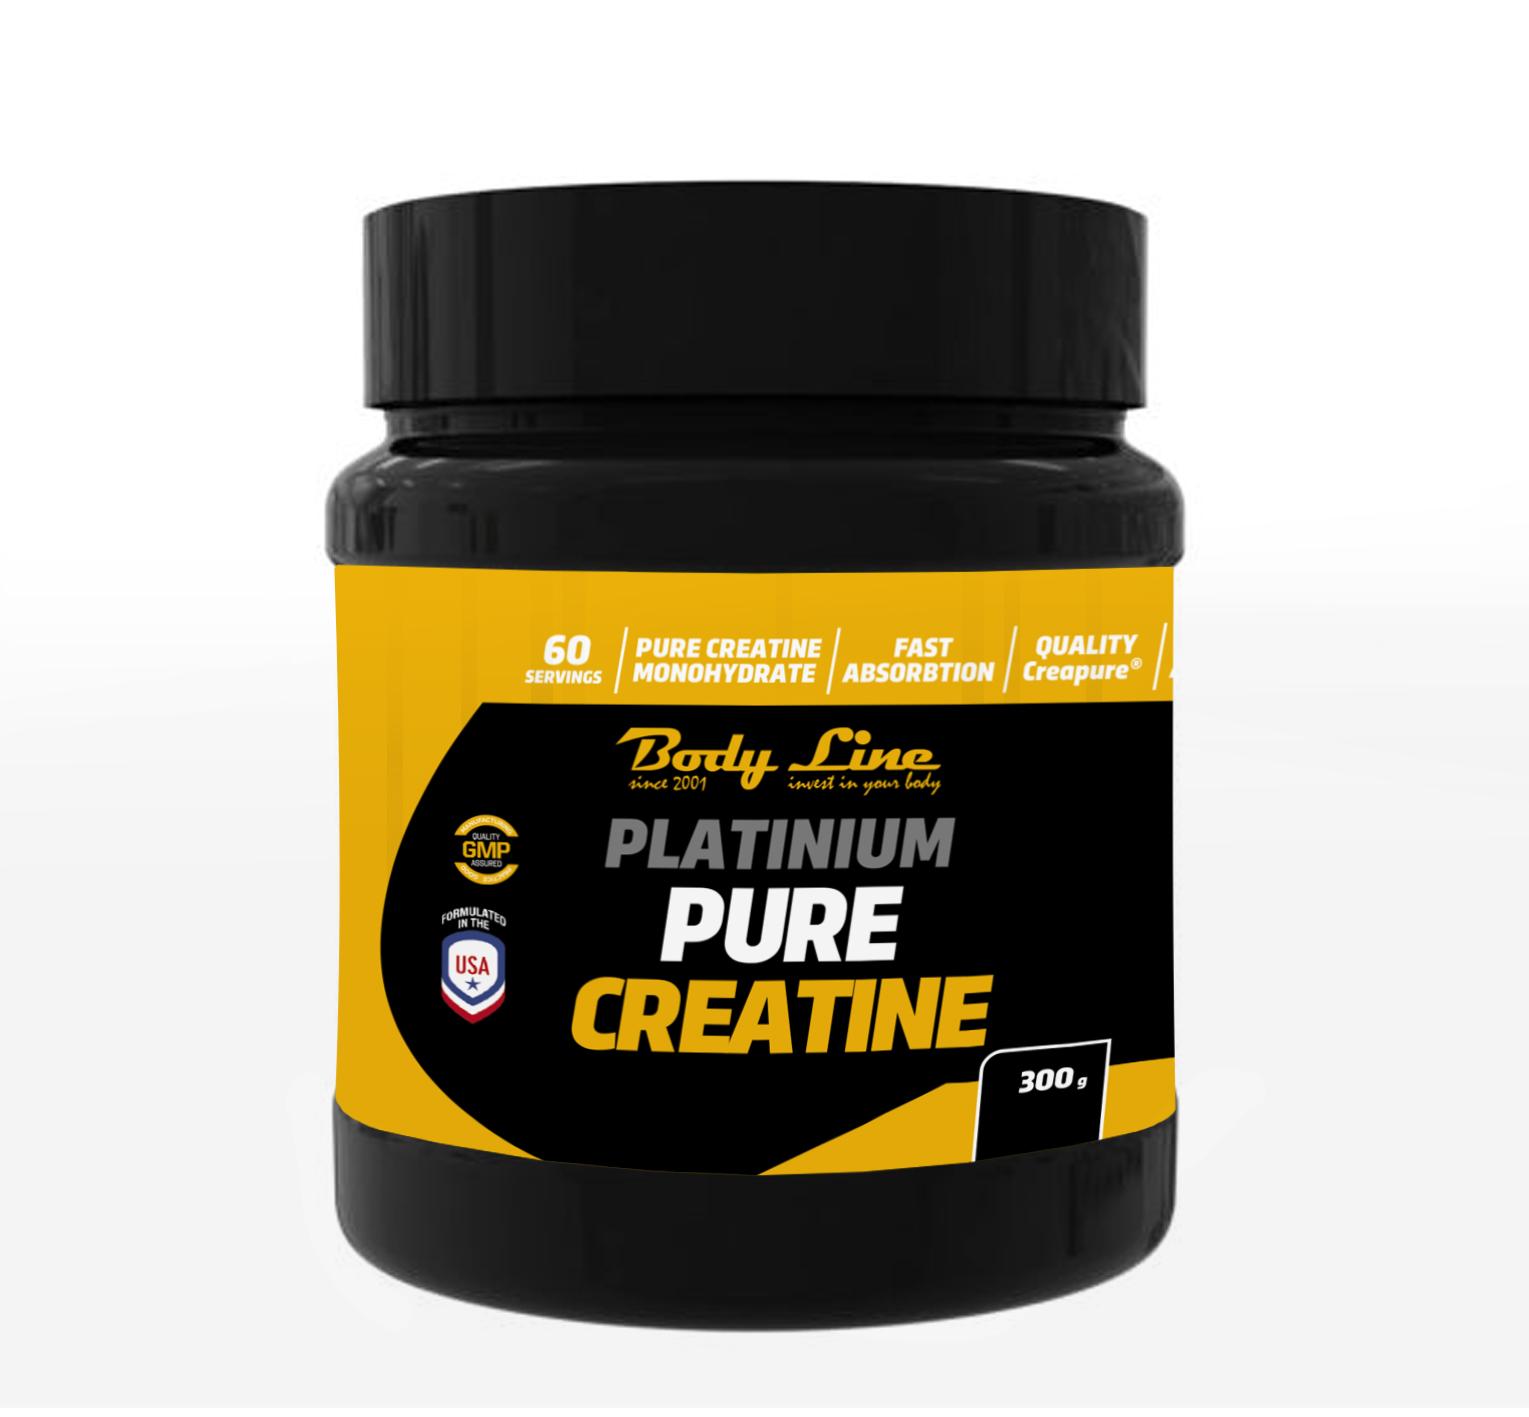 pure creatine creapure - creatina monohidrata